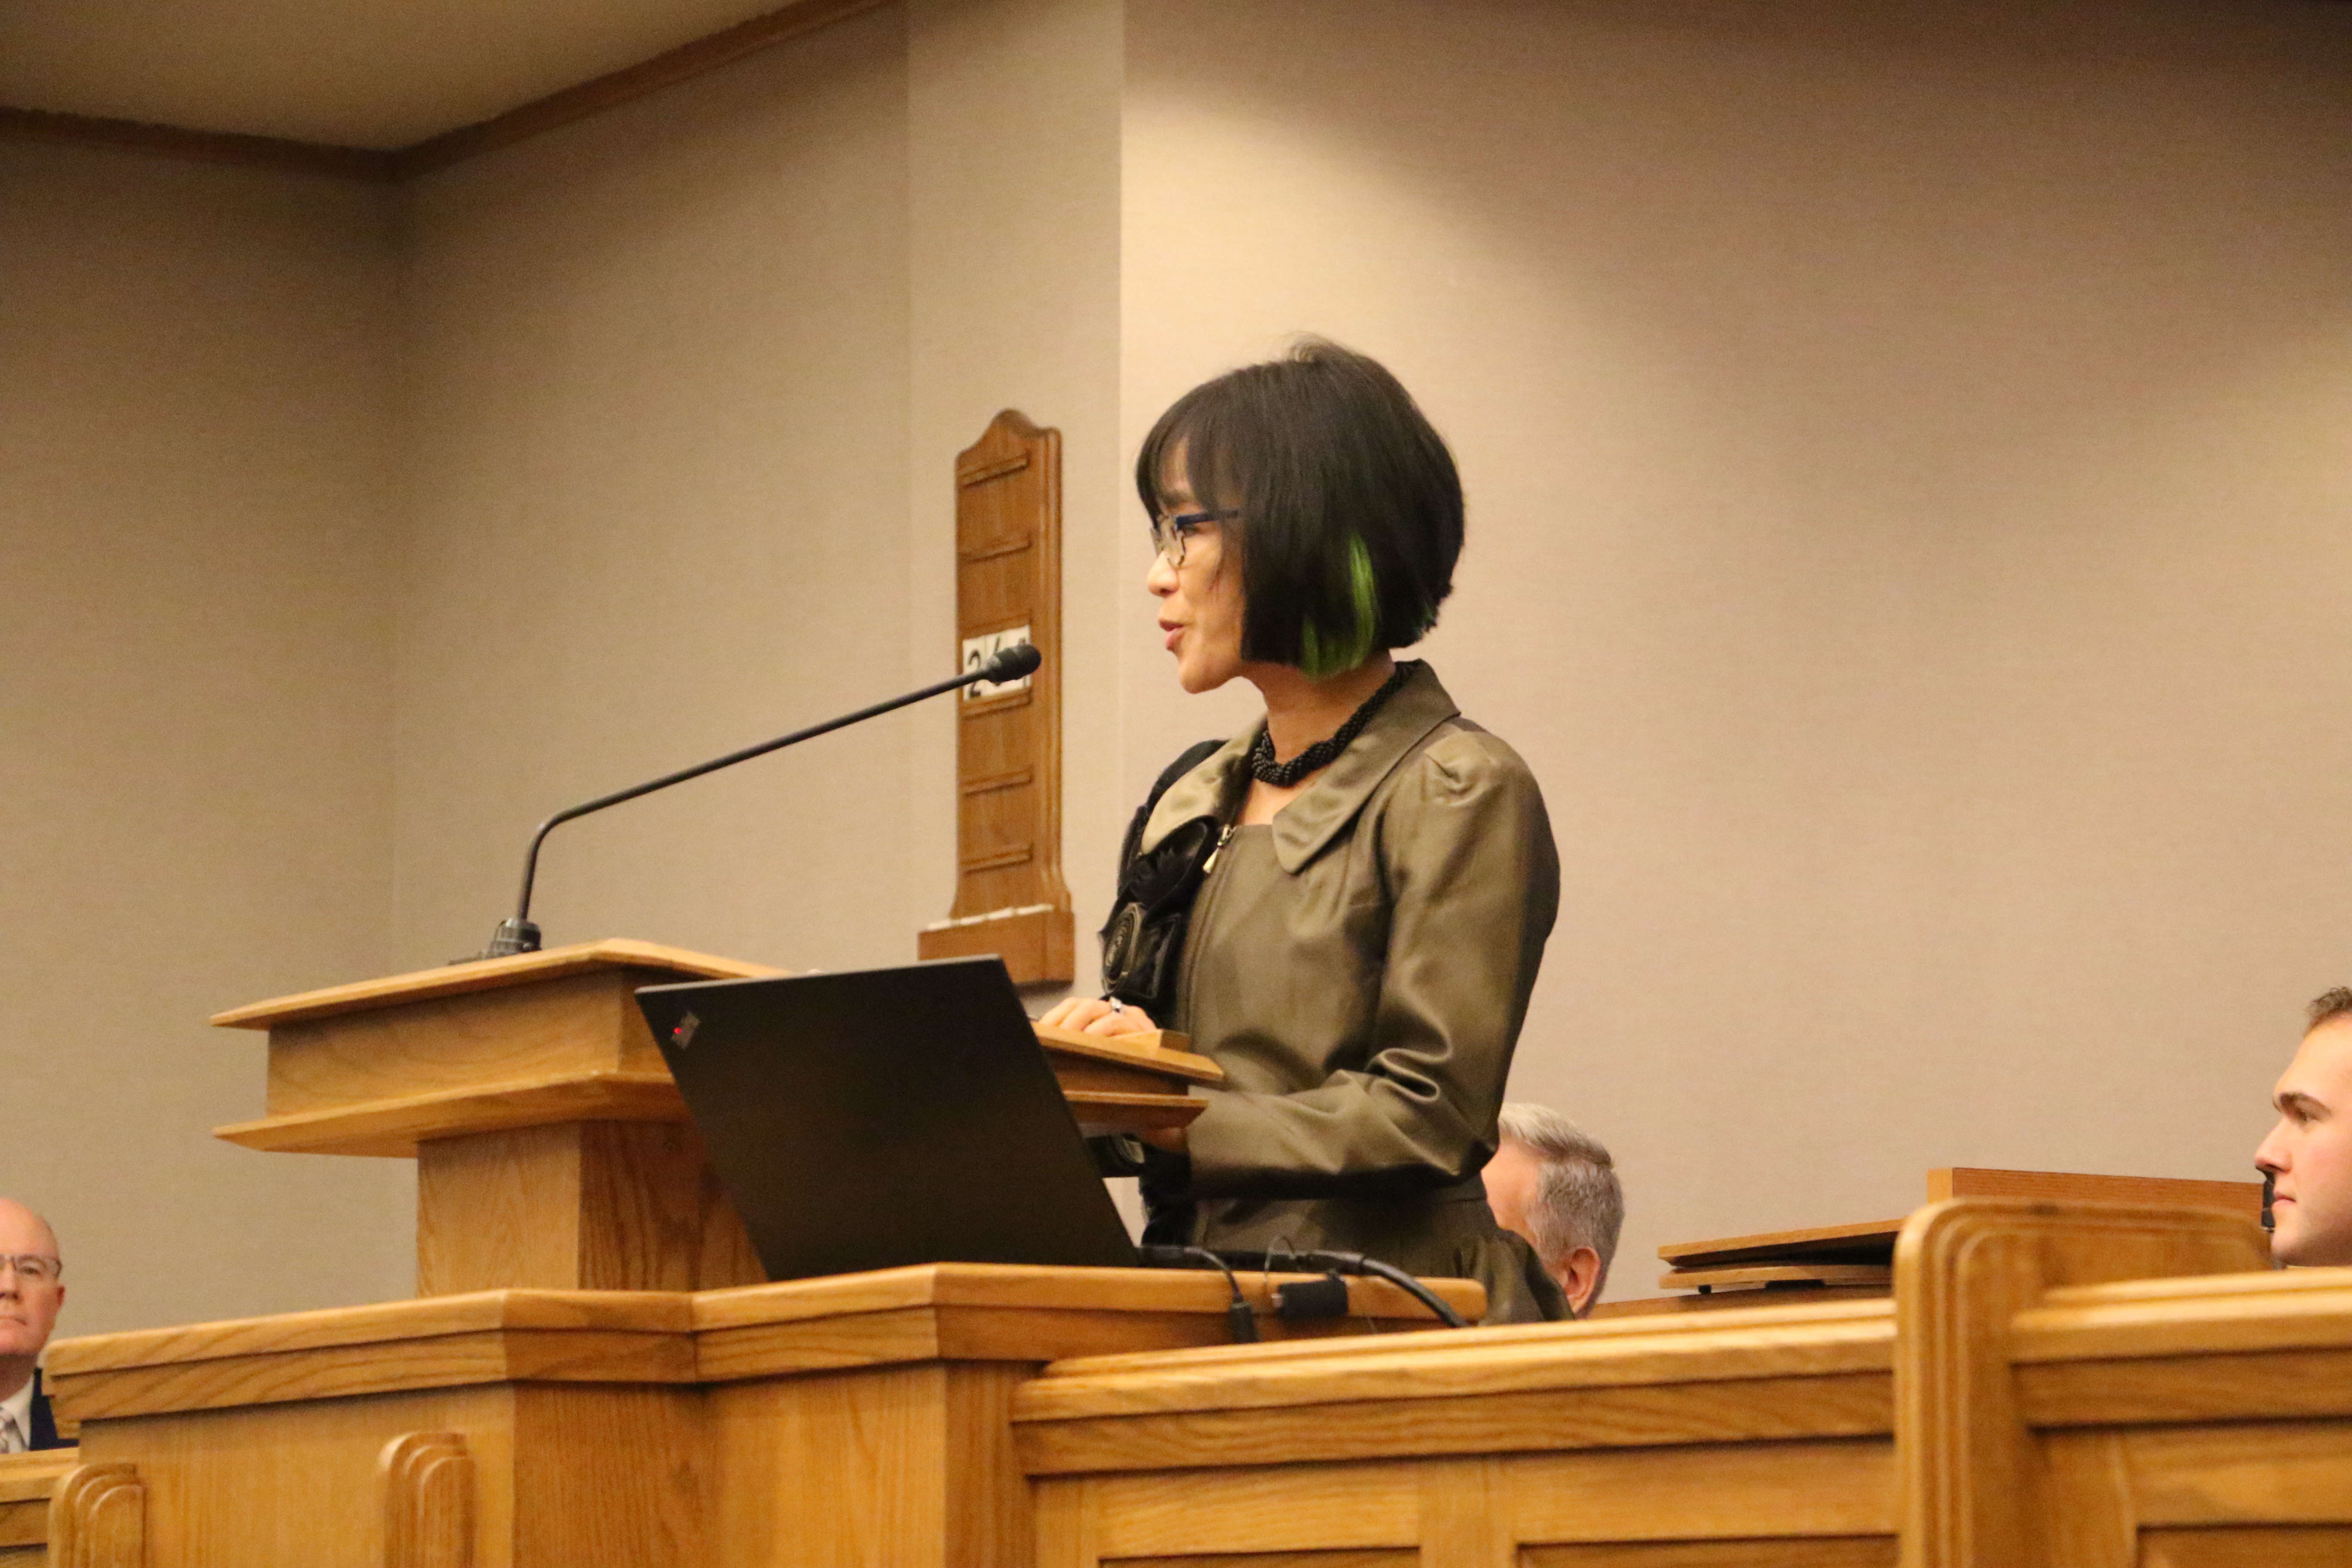 UVU President Astrid S. Tuminez speaks at a devotional on the UVU campus in Orem, Utah on Friday, Sept. 20, 2019.